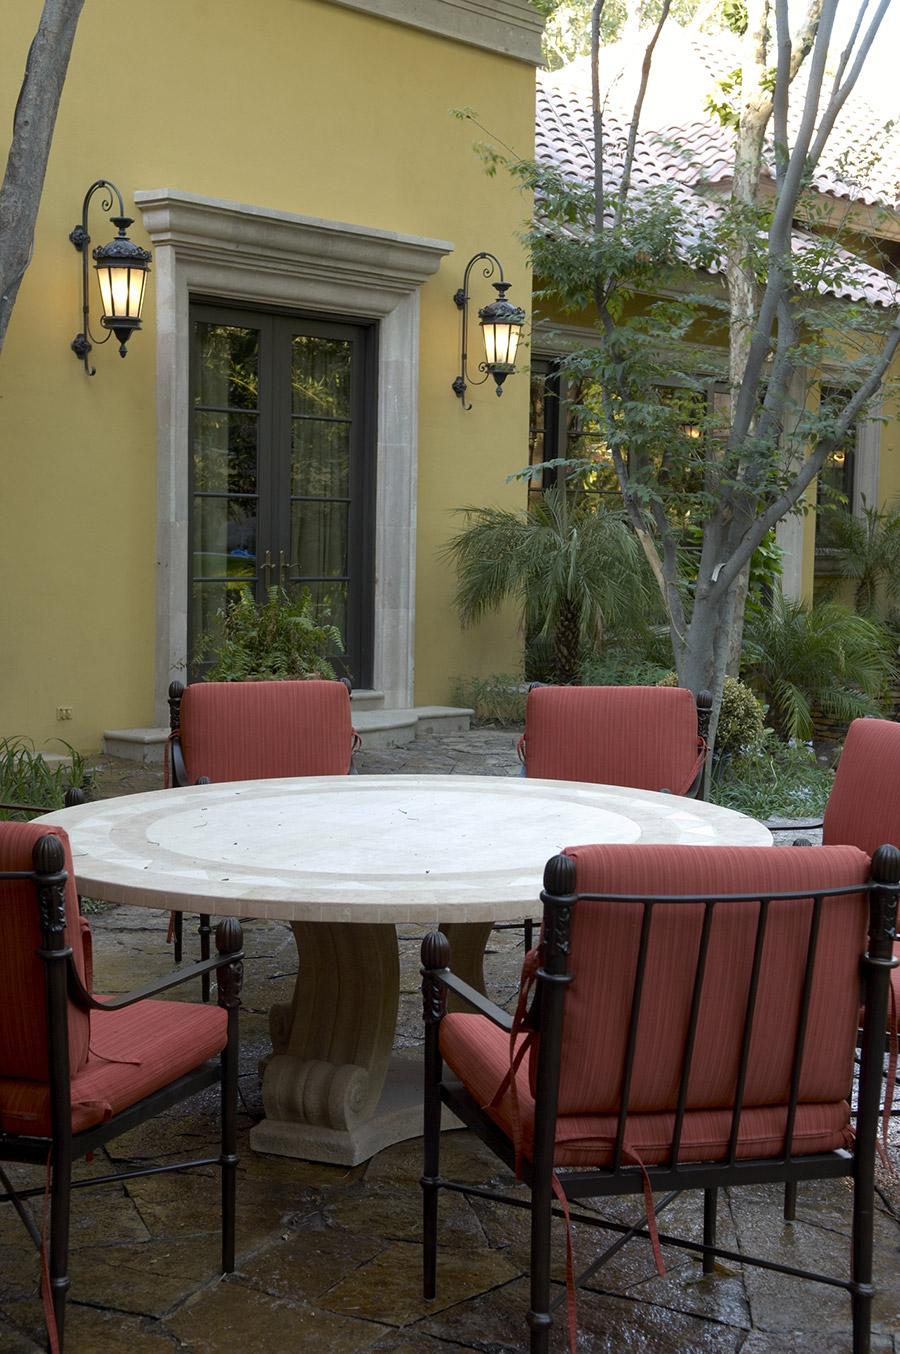 Chianti-OLS-CLA-E-003-classic--outdoor-Steel-Lighting-Post-Santa-Barbara-Residence-(22)